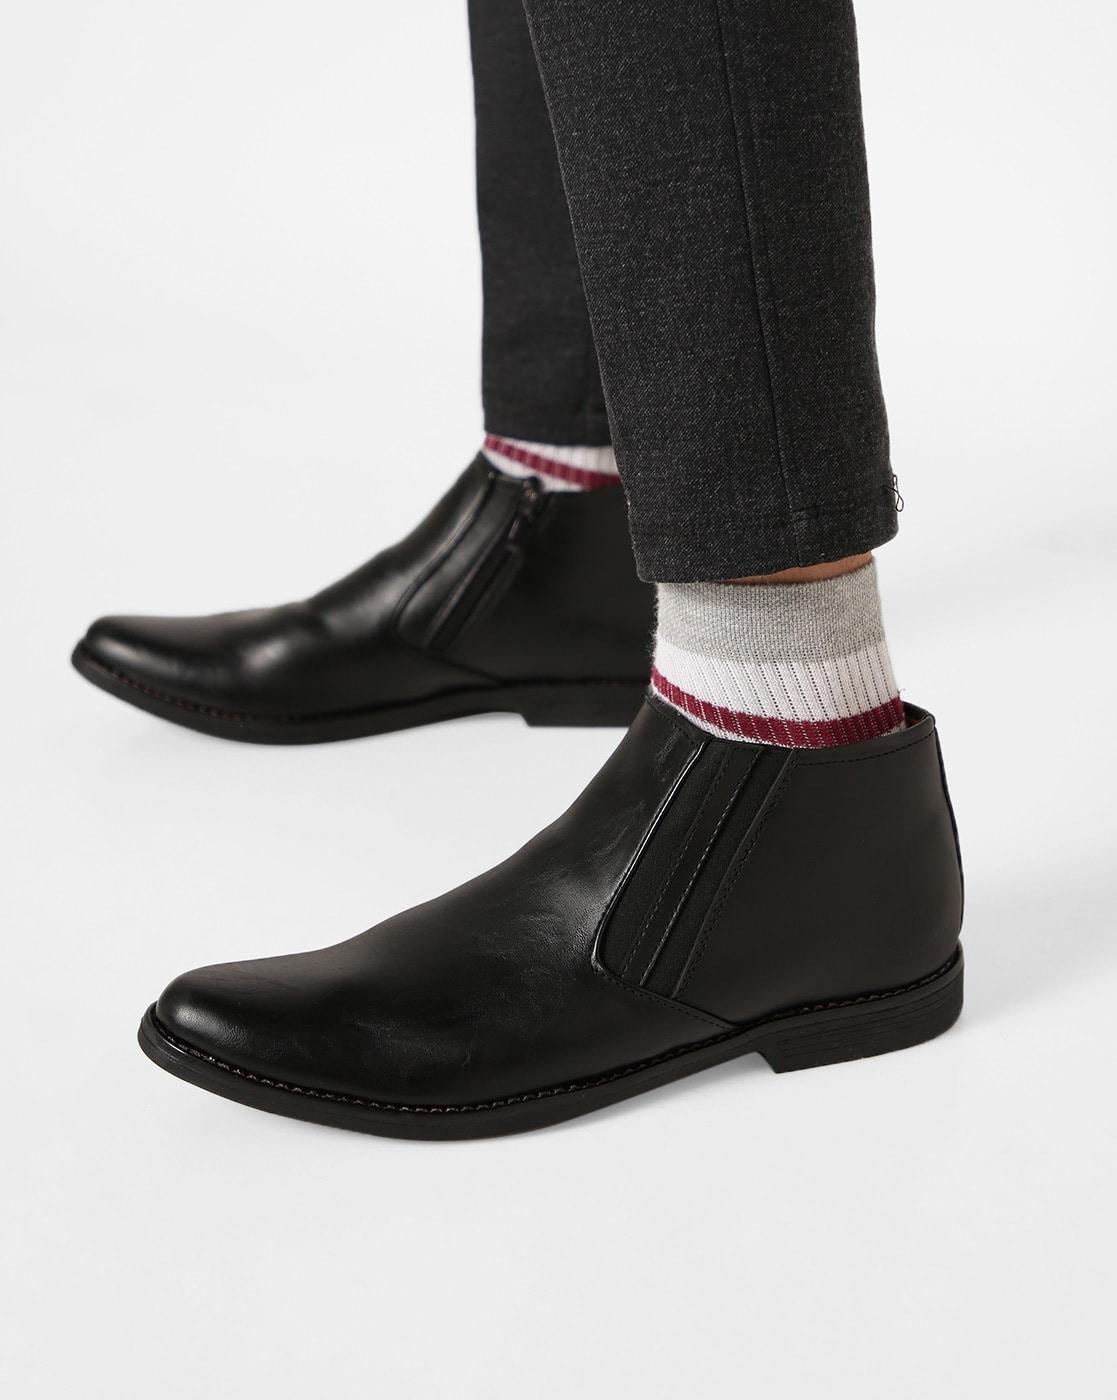 Buy Black Formal Shoes for Men by